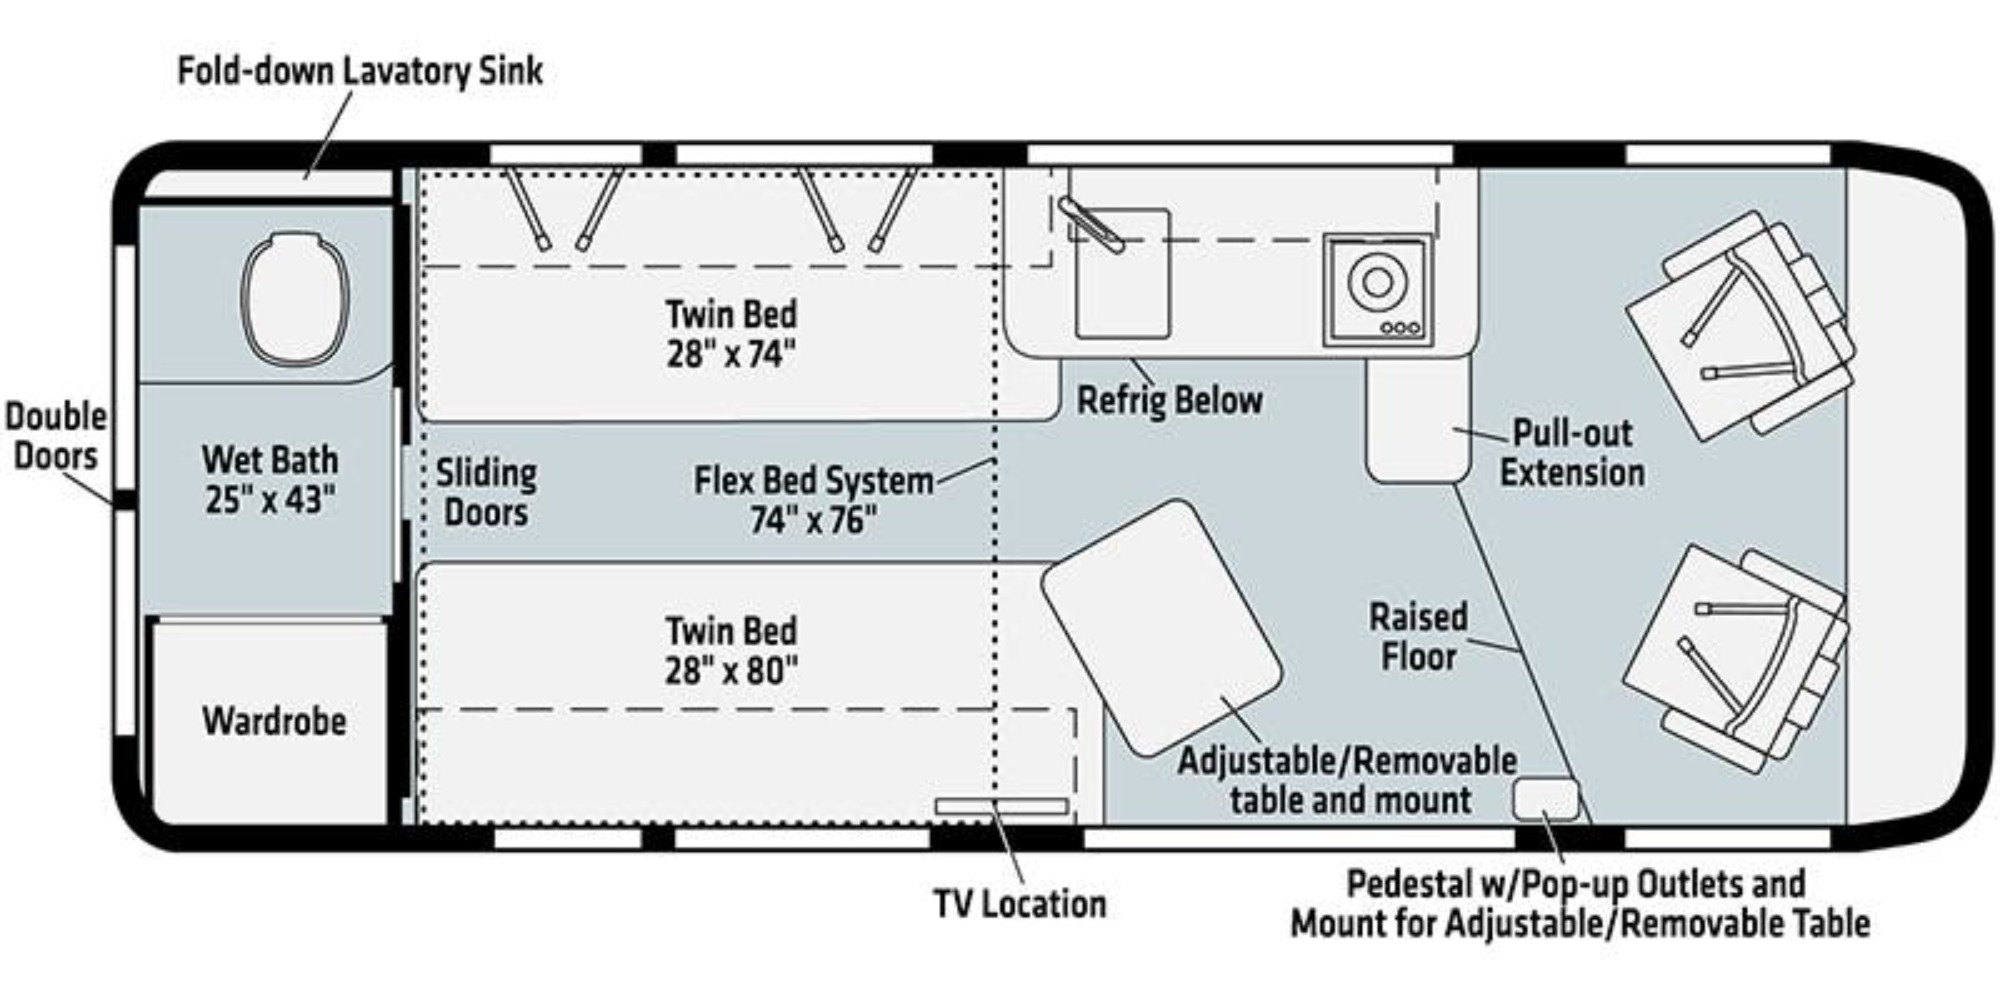 View Floor Plan for 2022 WINNEBAGO TRAVATO 59KL